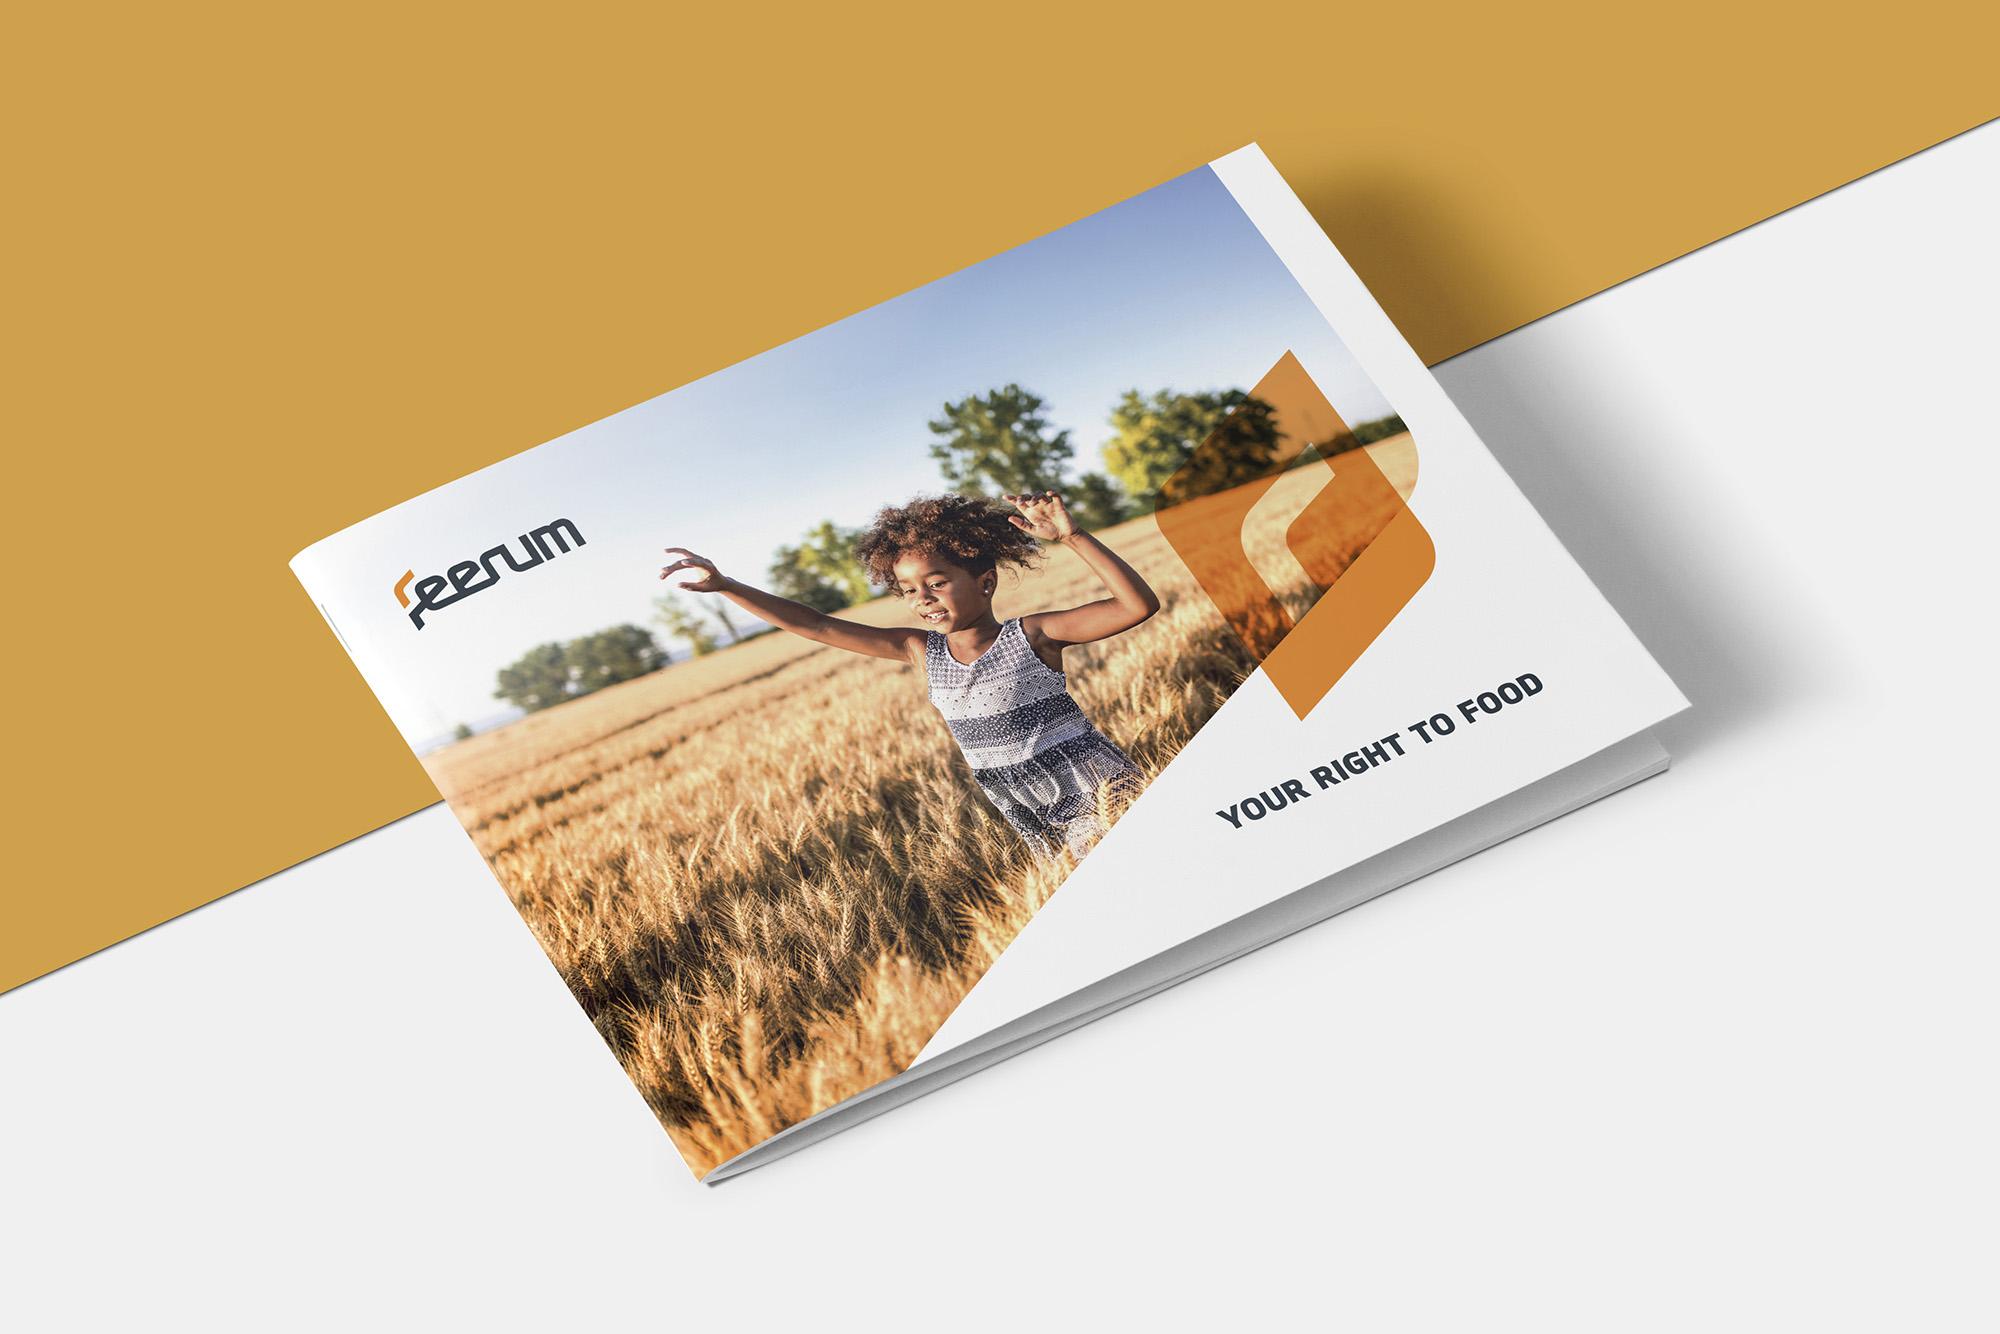 feerum folder 3.jpg